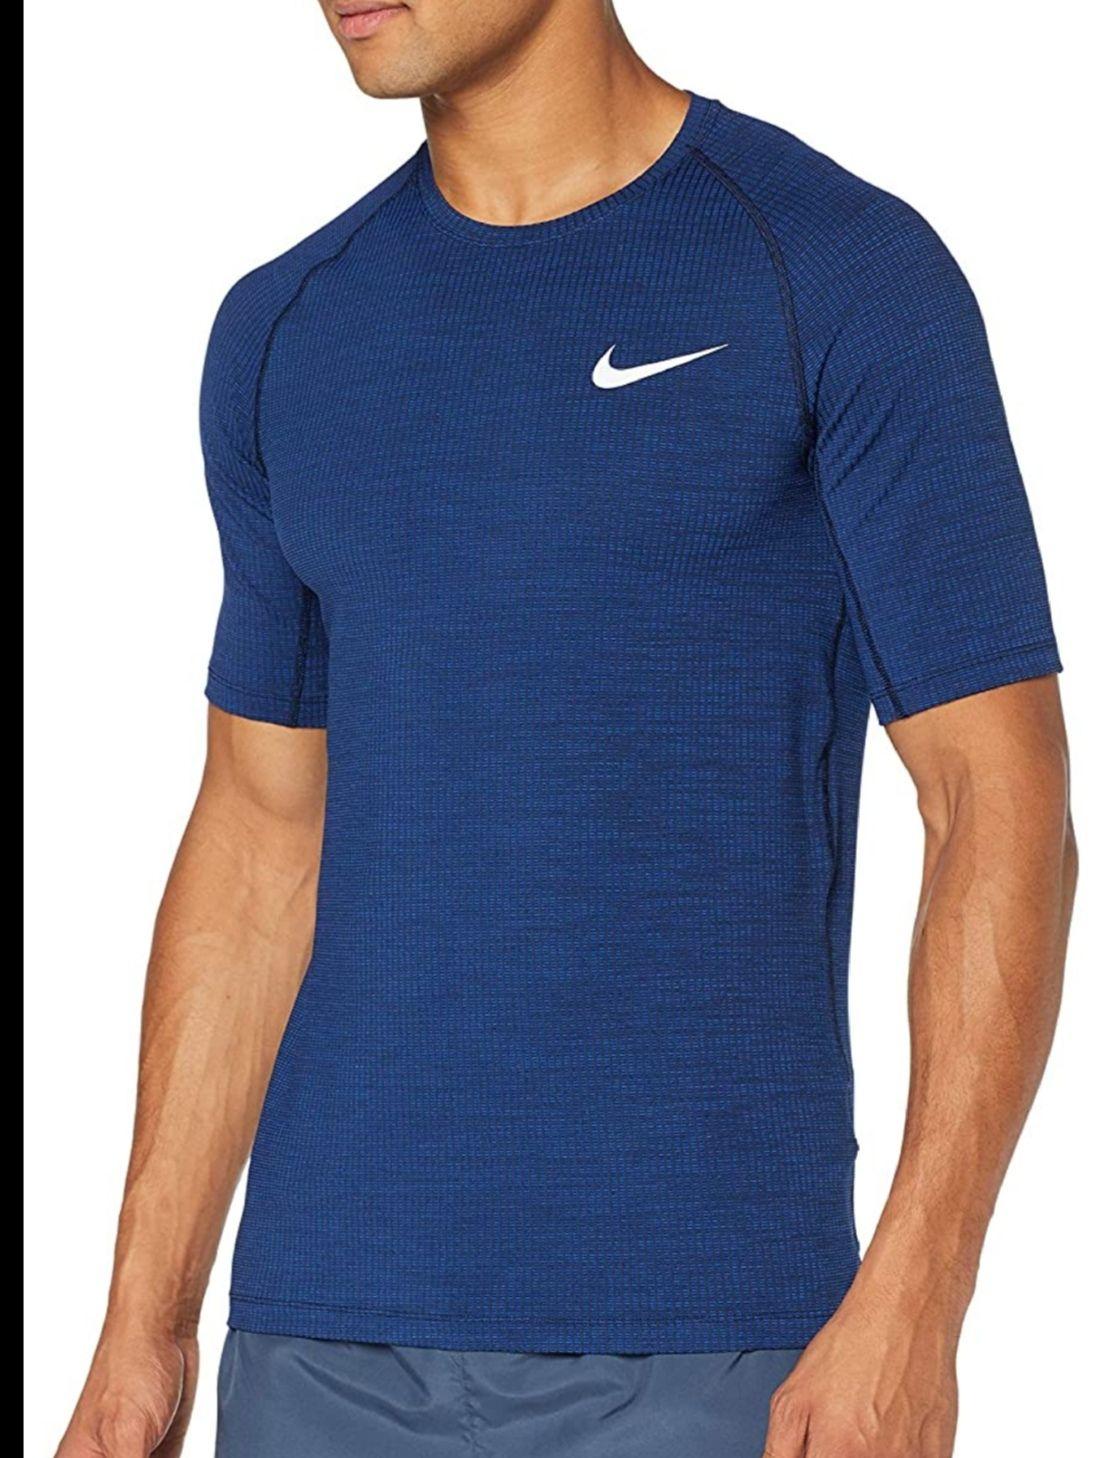 Nike Herren Top XL Slim